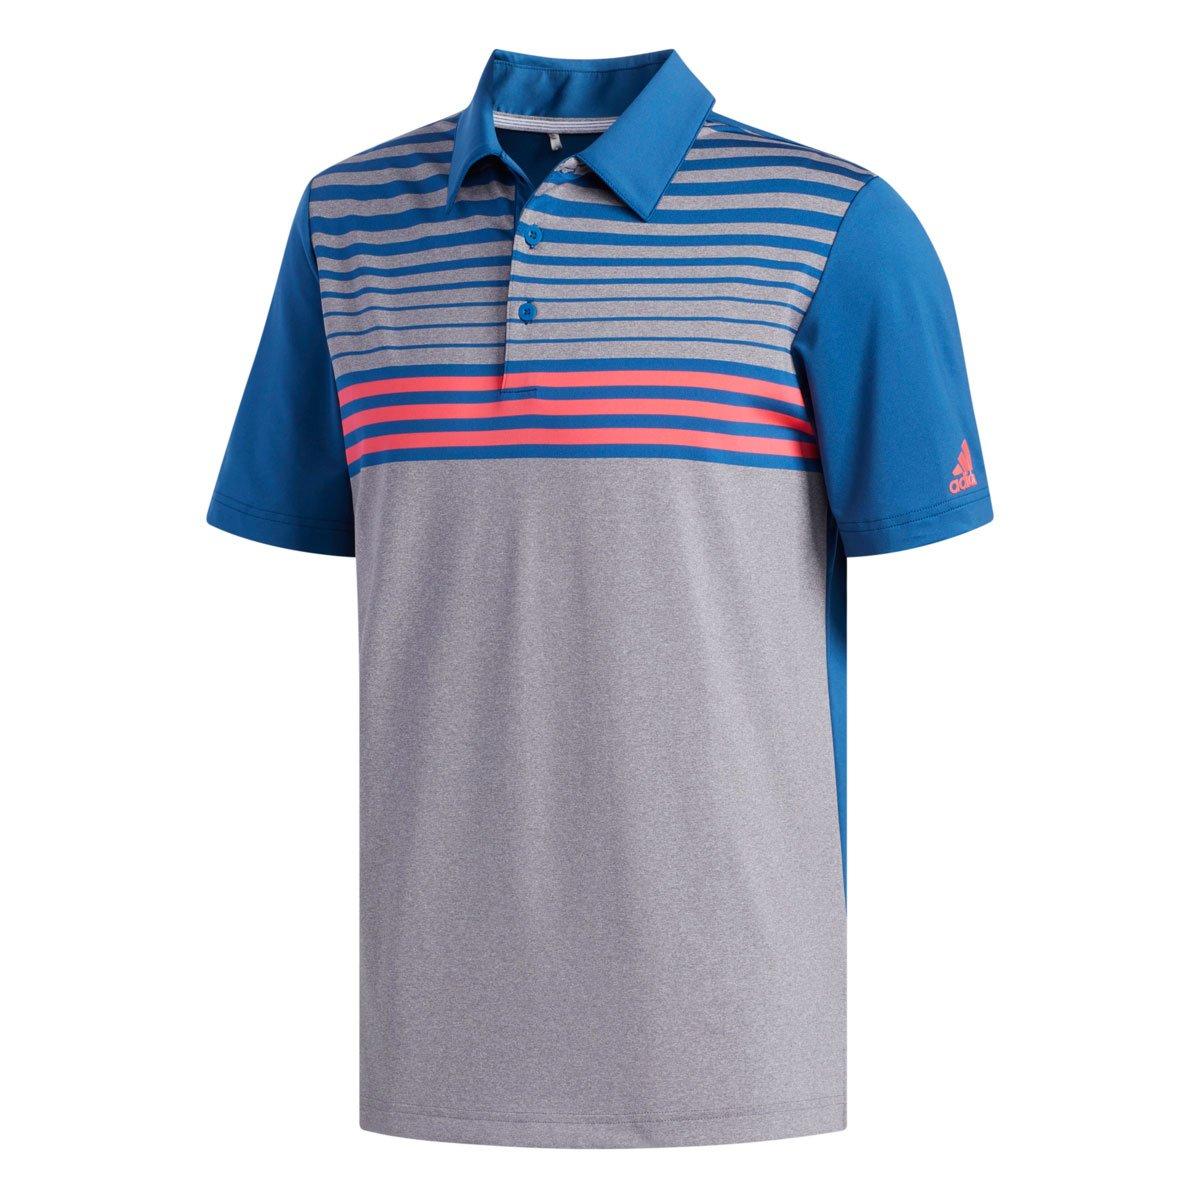 Adidas Ultimate 3-Stripe Heather Gradient Grey/Marine/Red Polo